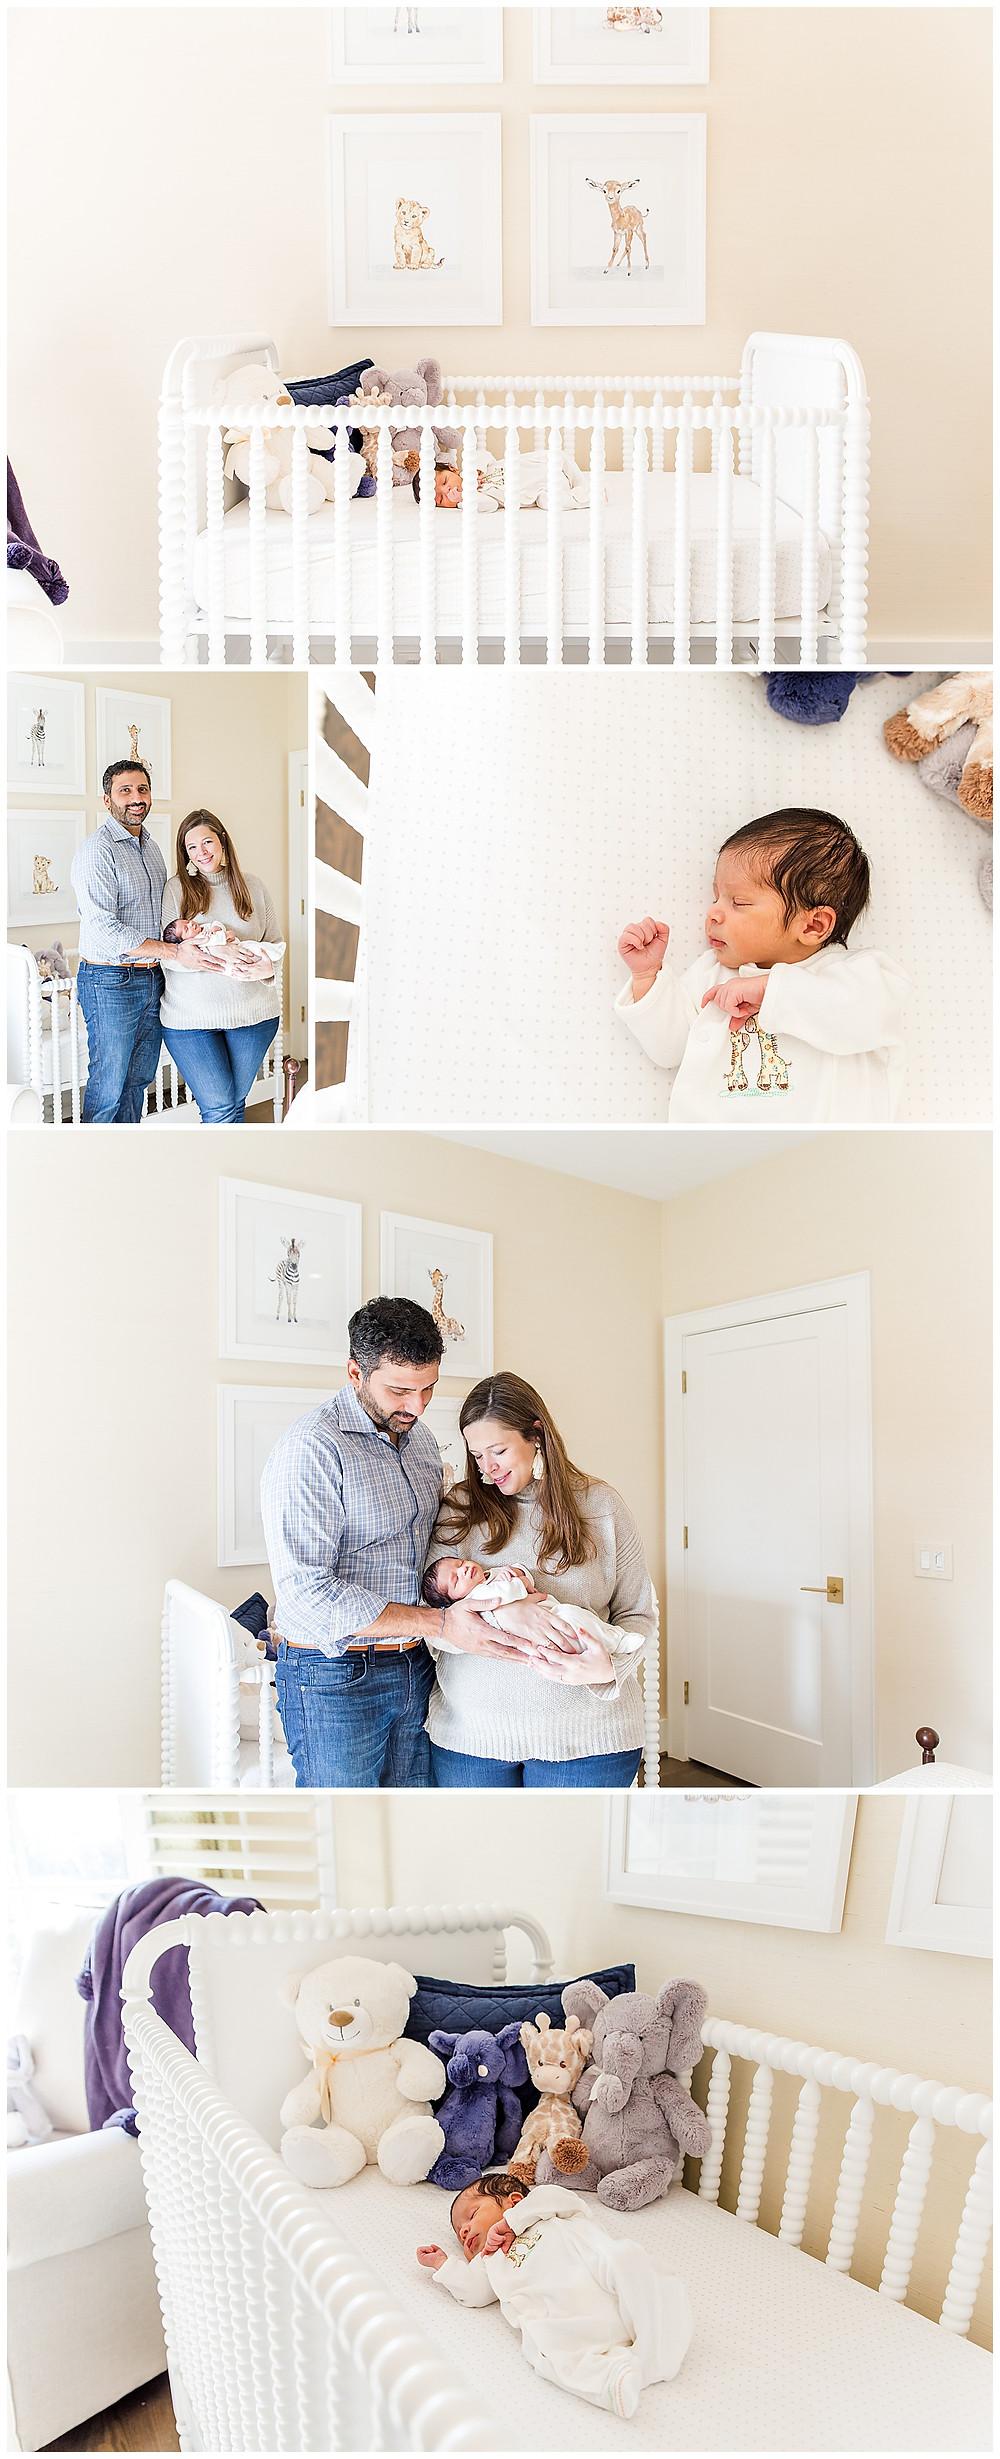 newborn photography in Dallas, TX